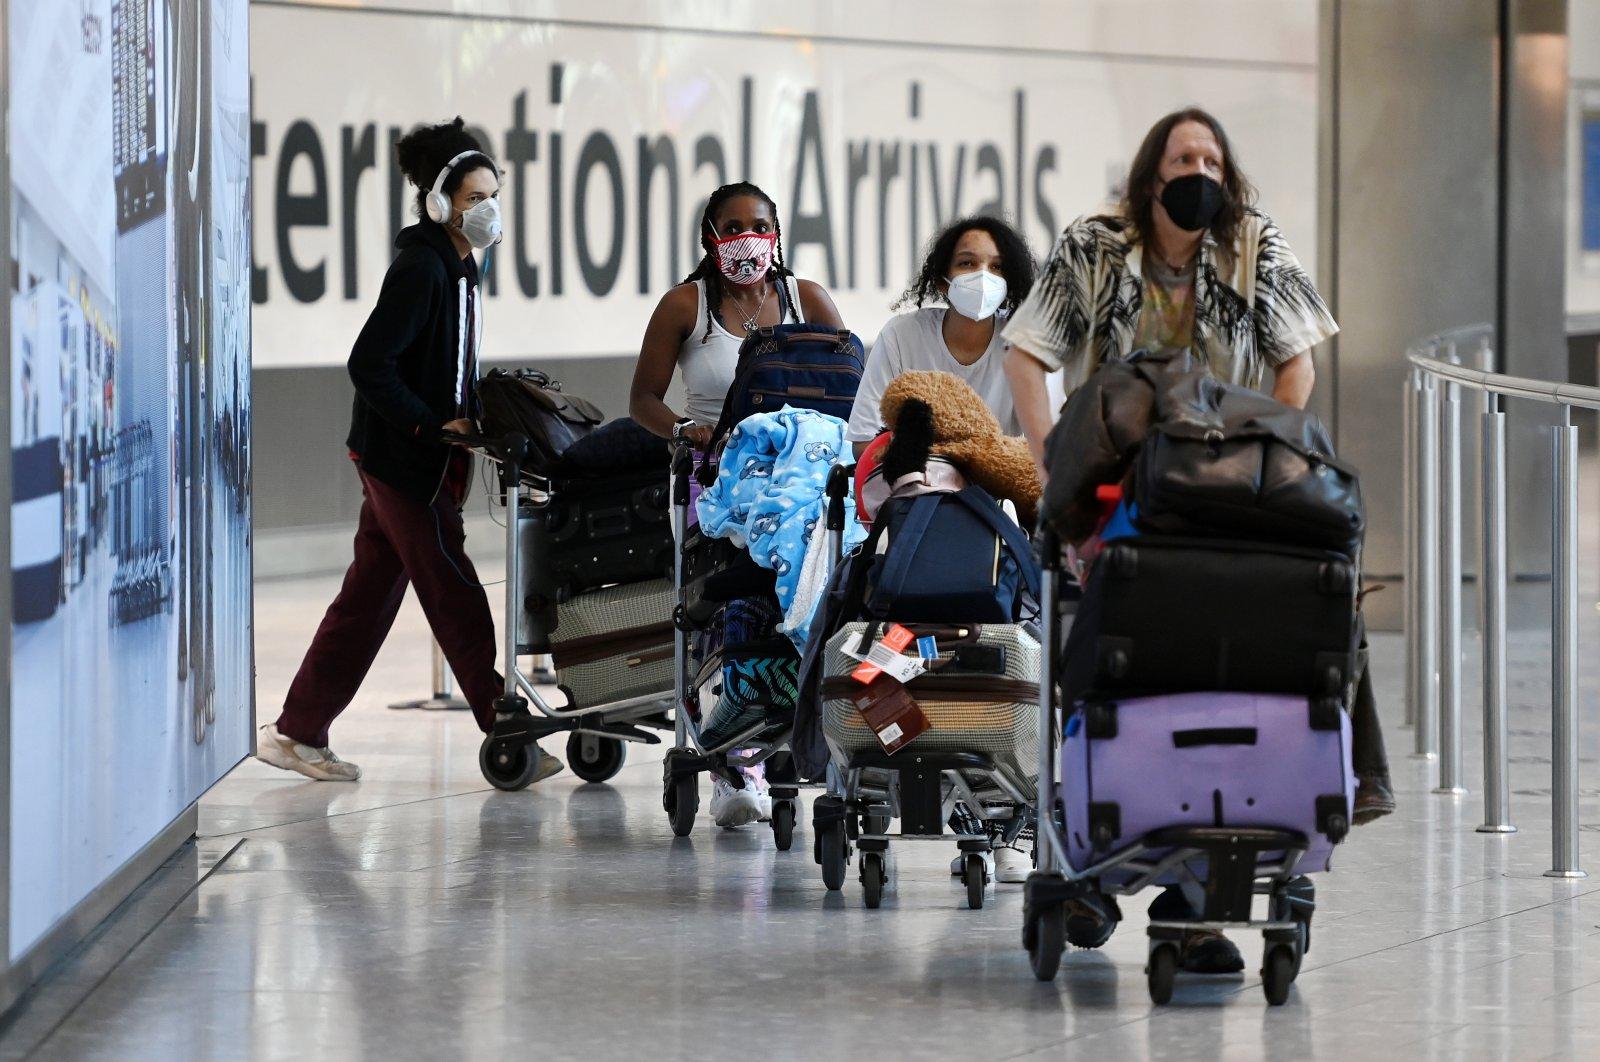 Travelers walk in Heathrow Airport in London, Britain, June 8, 2021. (EPA Photo)